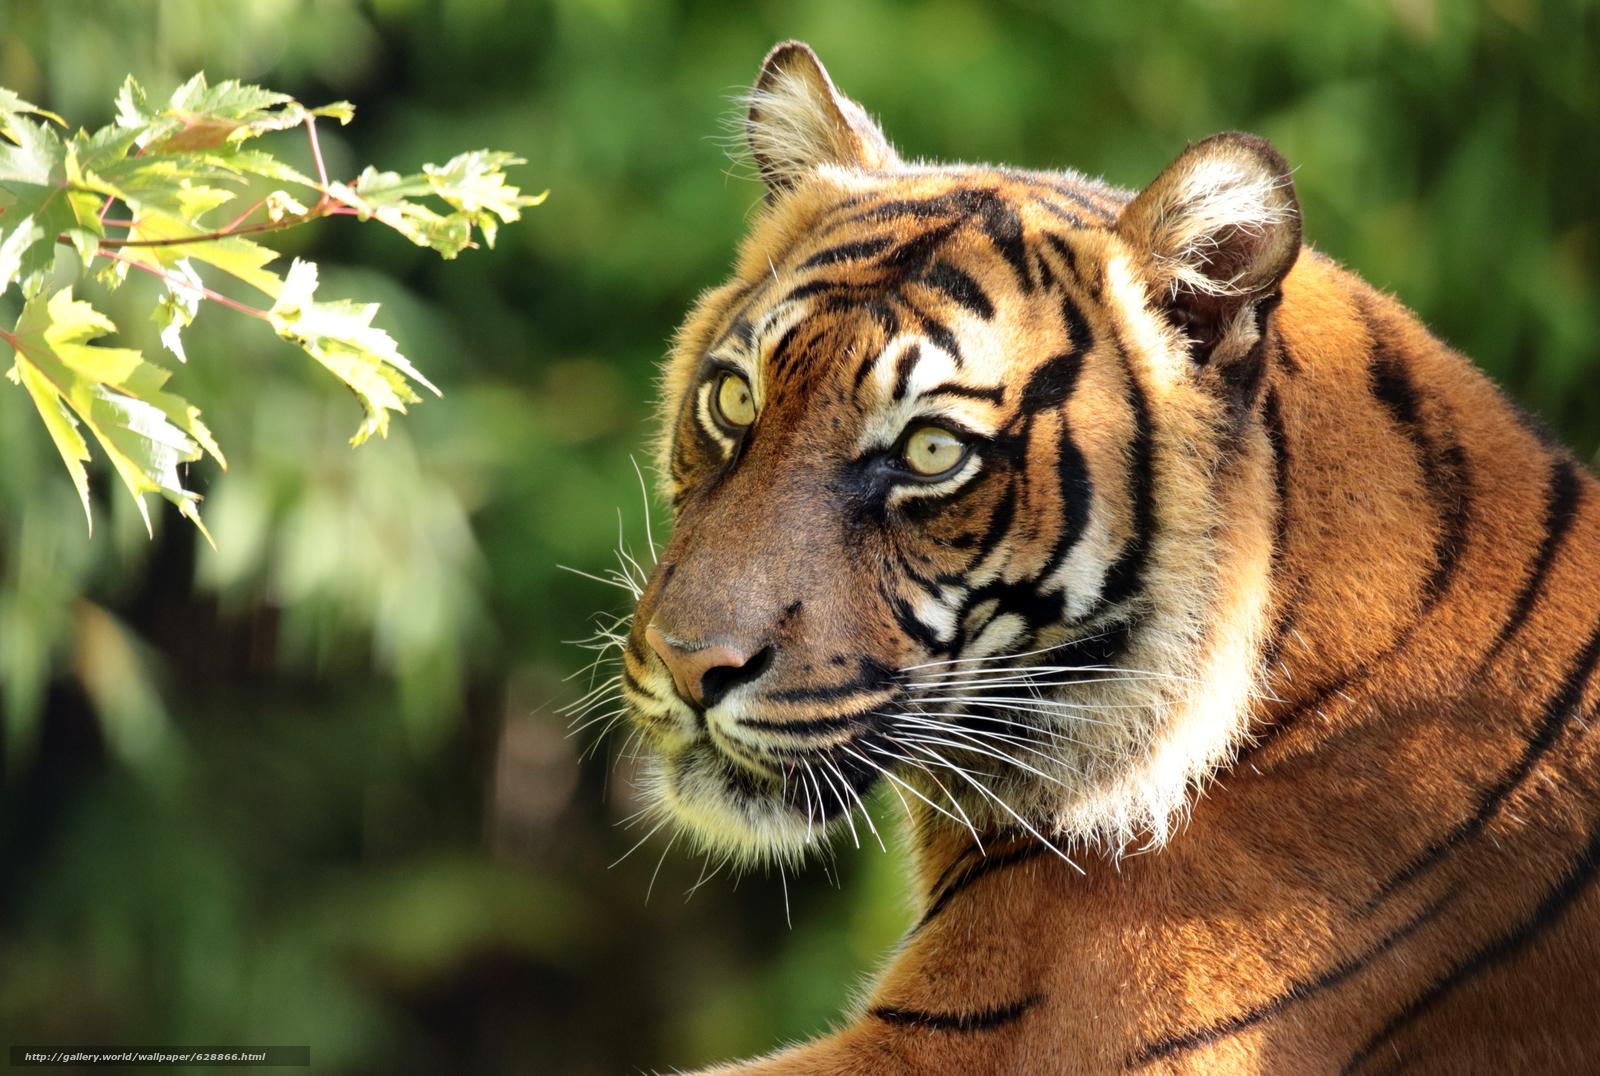 Обои Суматранский тигр, тигр, хищник, морда, портрет, ветка